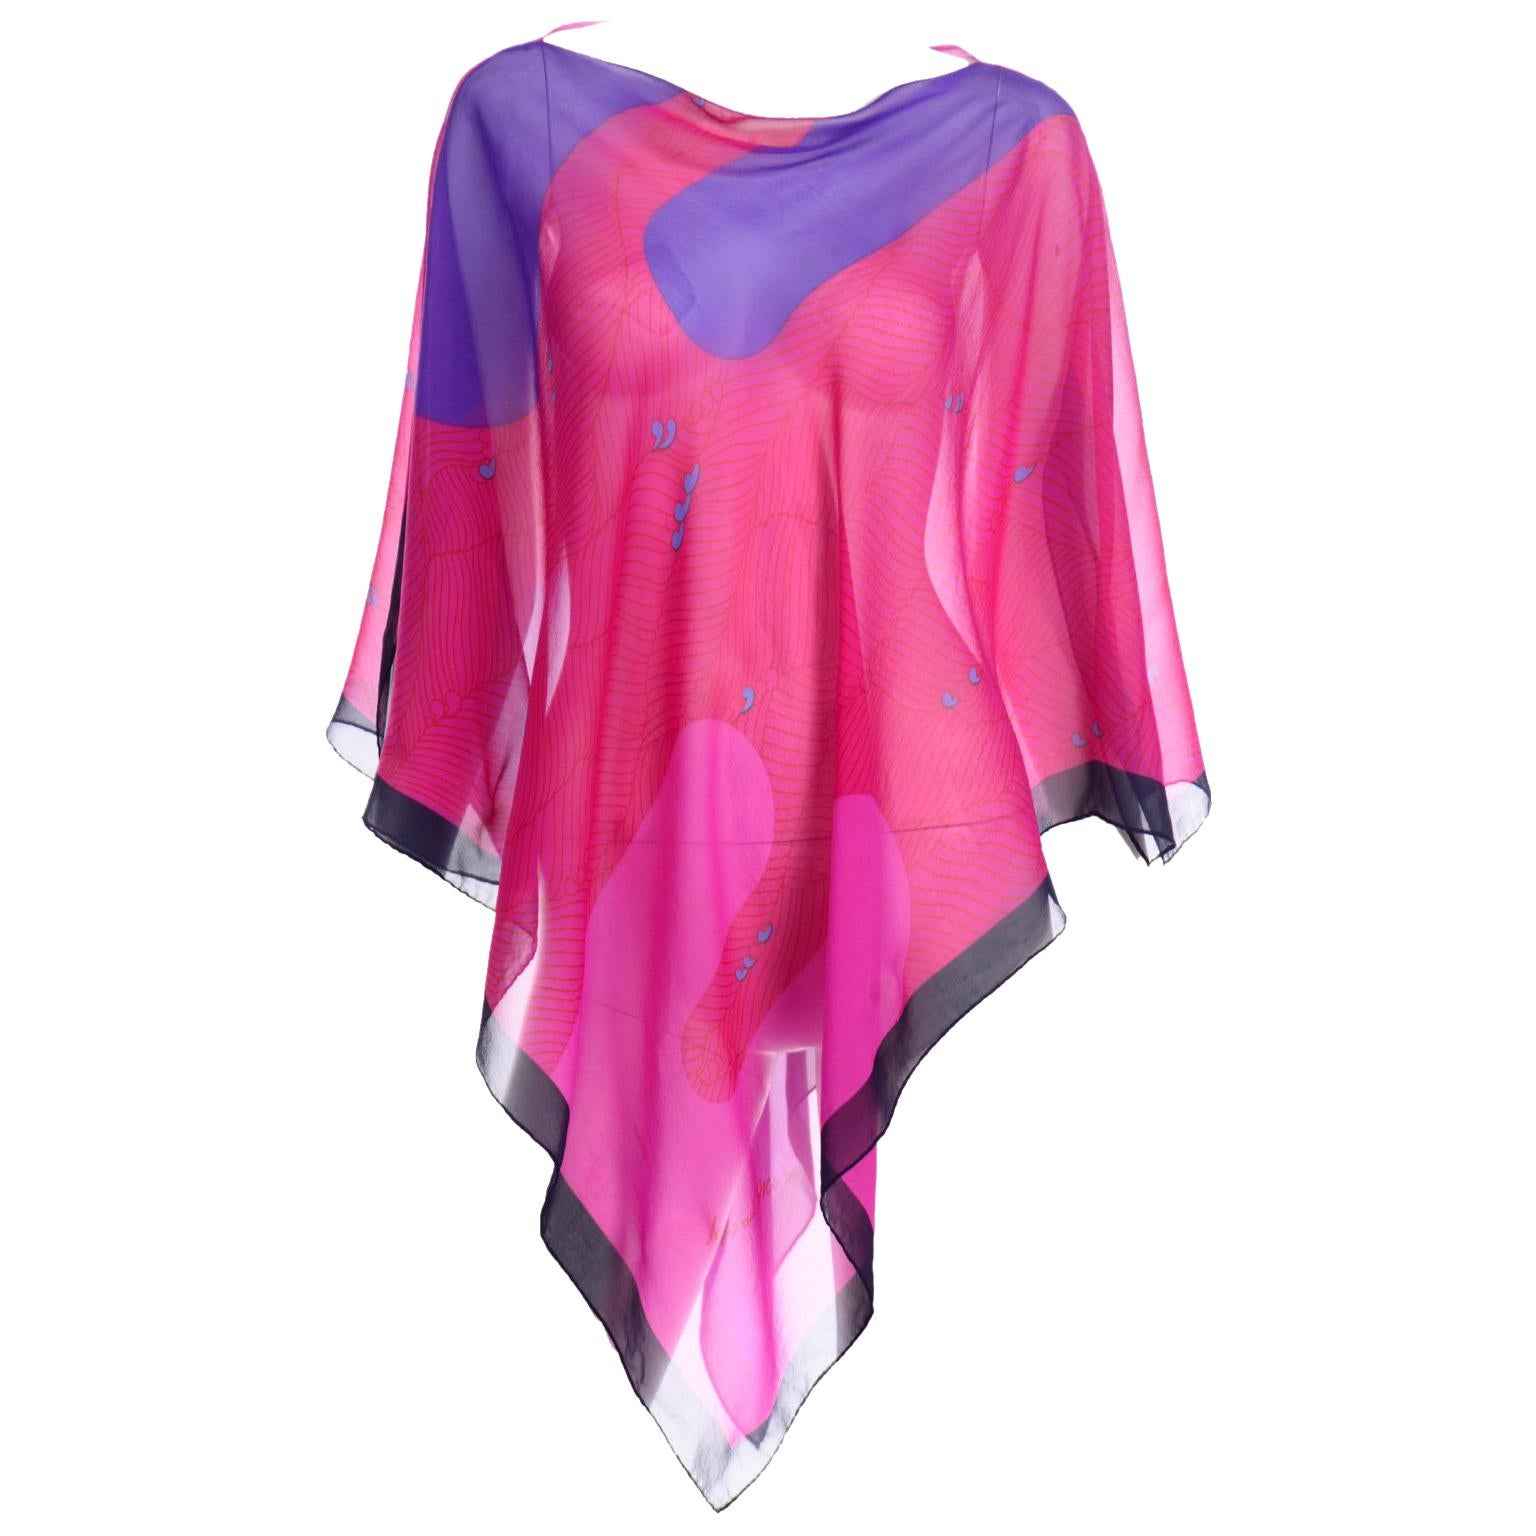 Hanae Mori Vintage Pink & Purple Silk Signed Print Poncho Style Top